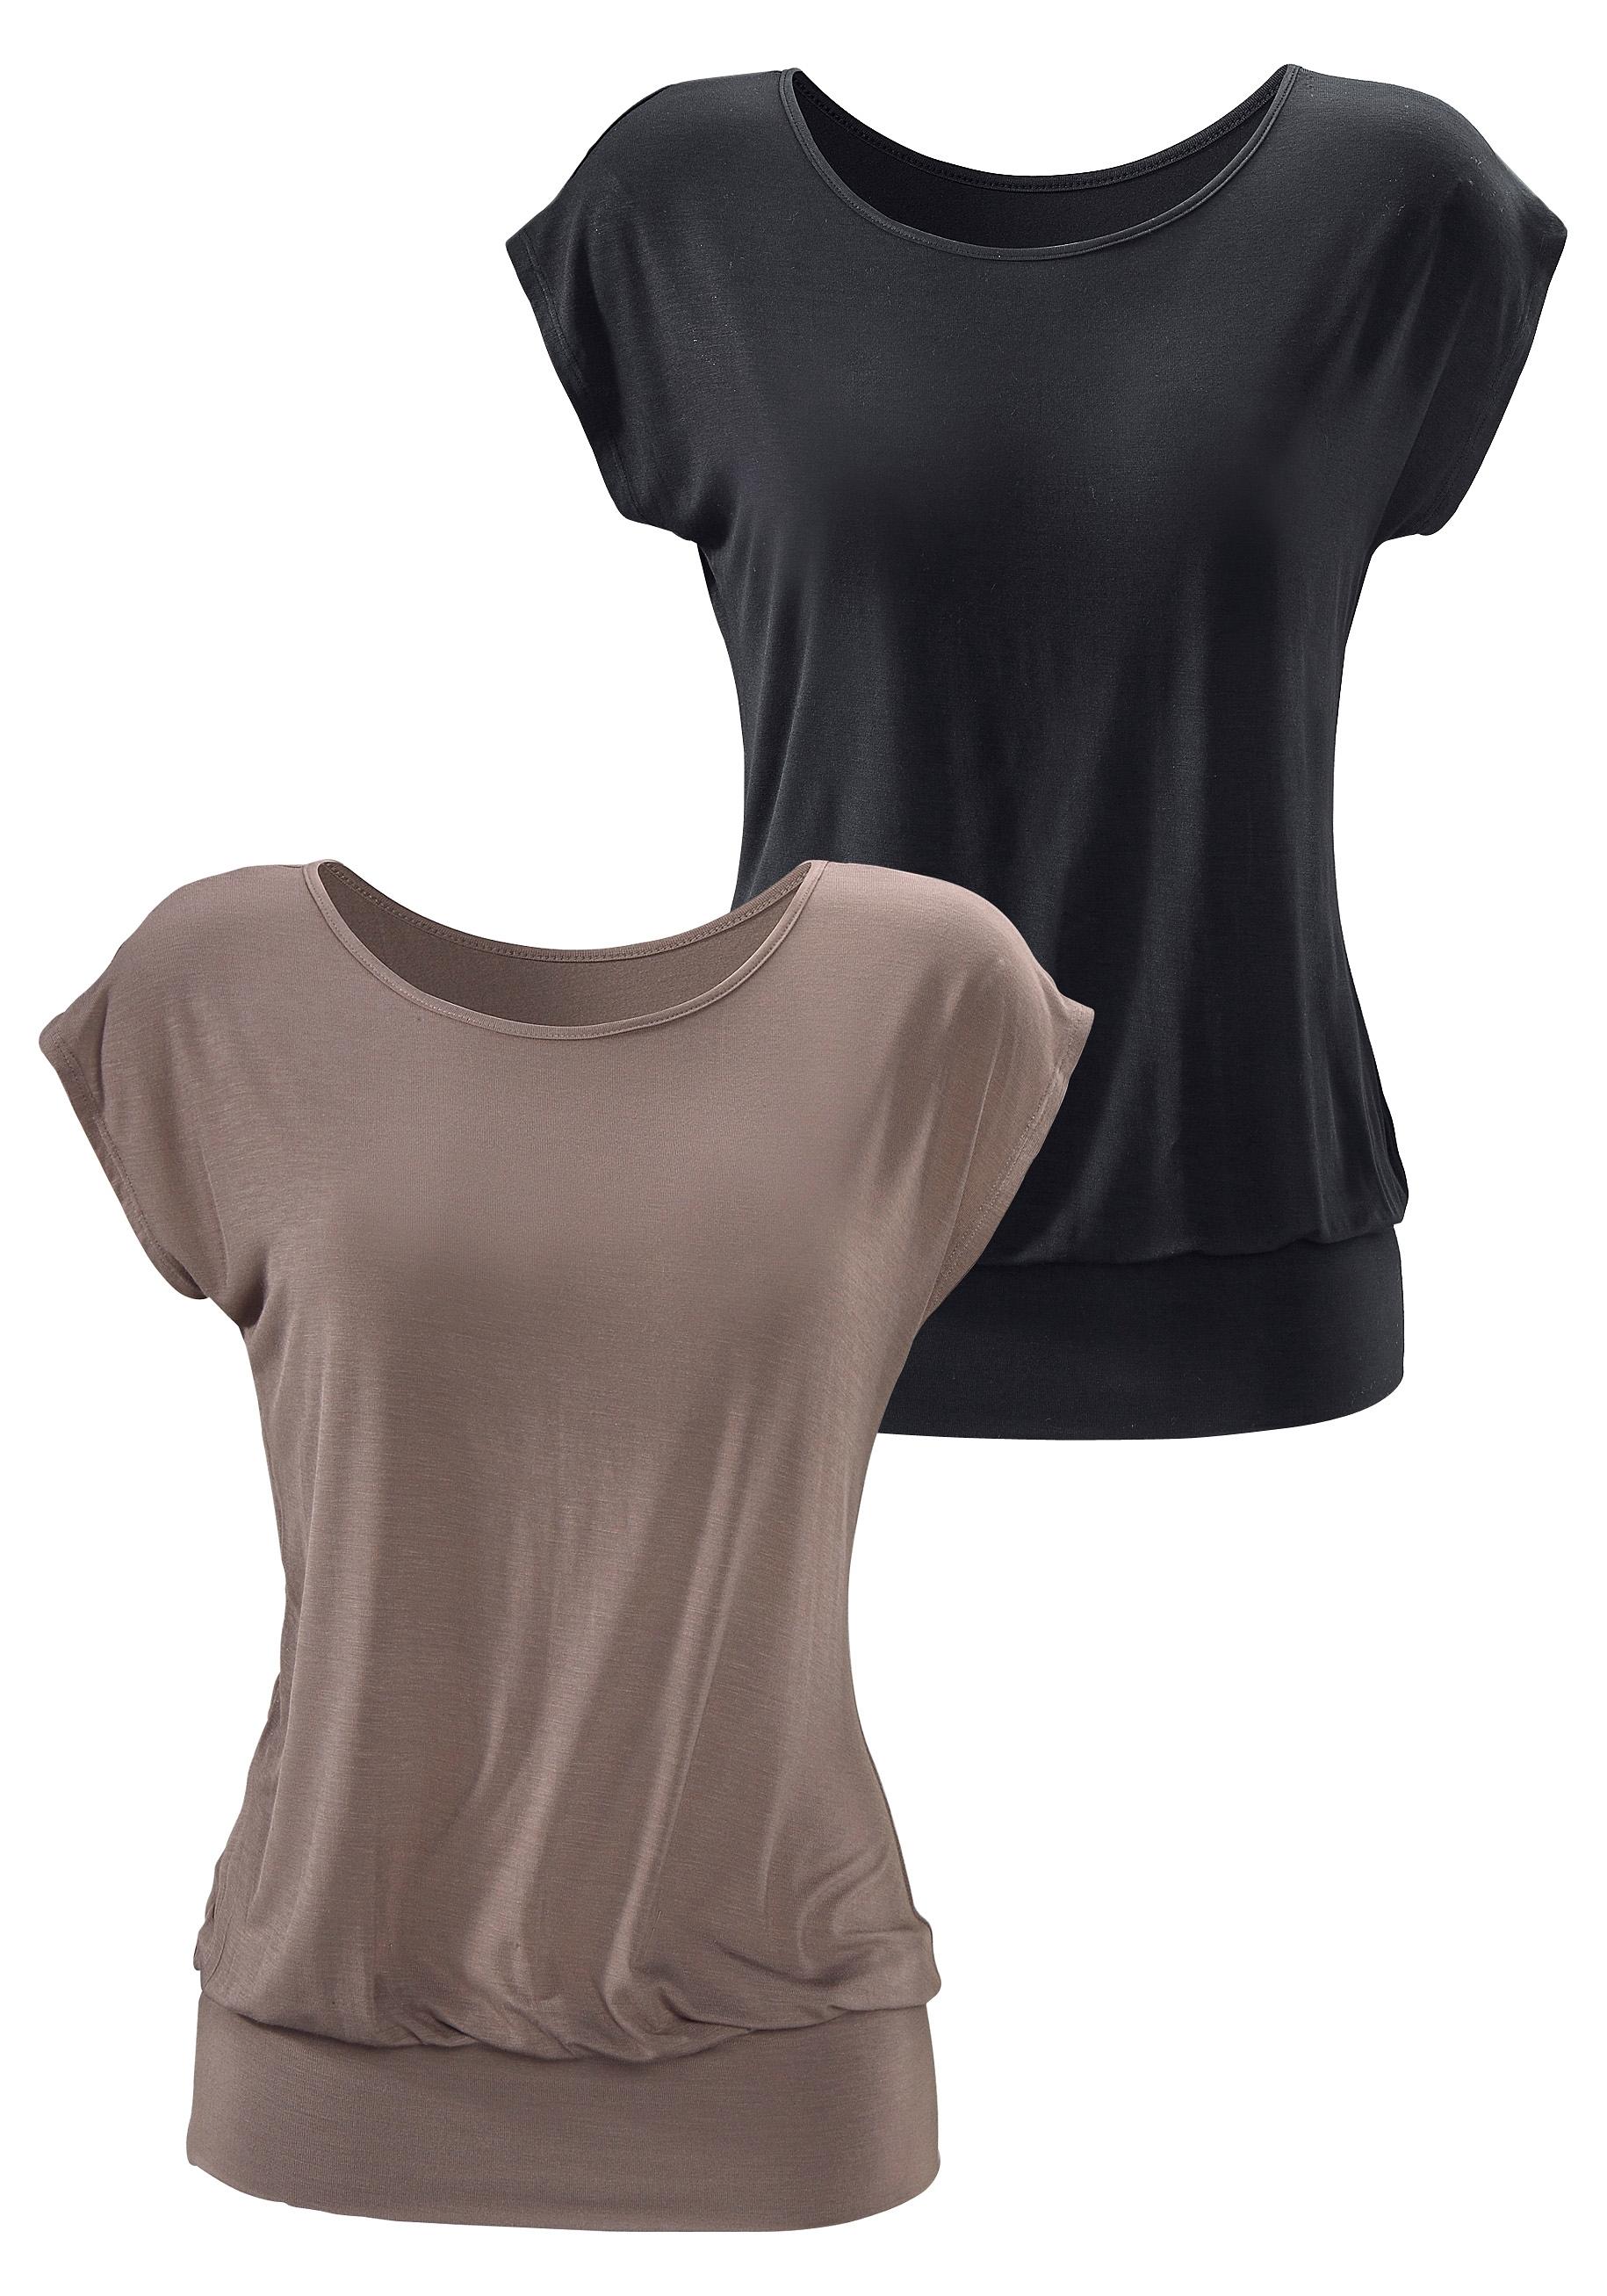 LASCANA Lang shirt in set van 2 goedkoop op lascana.nl kopen